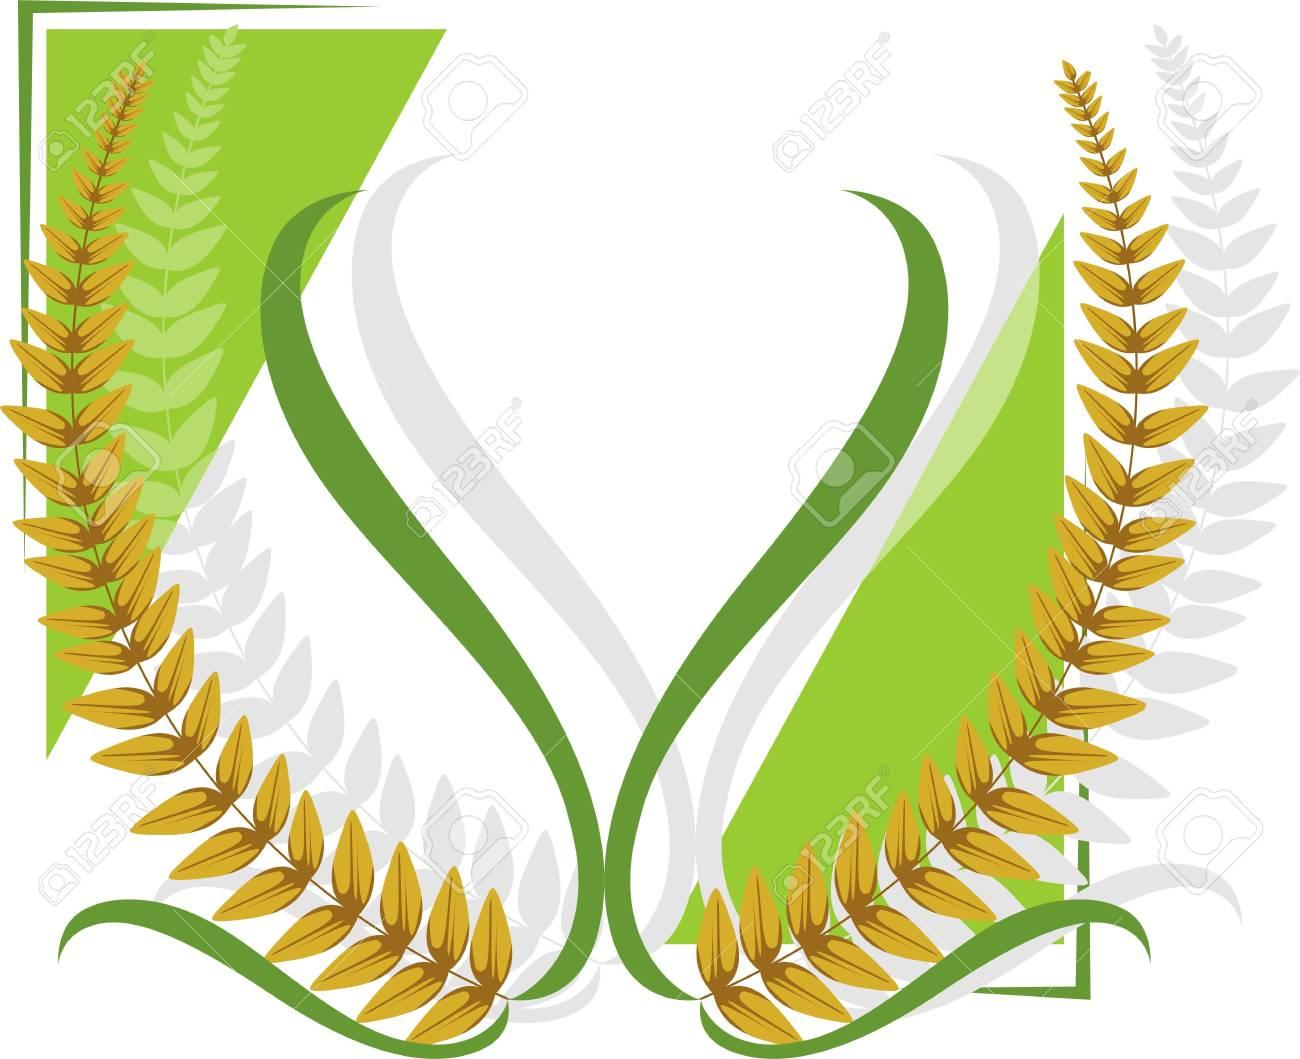 Illustration of a wheat Stock Illustration - 3919432